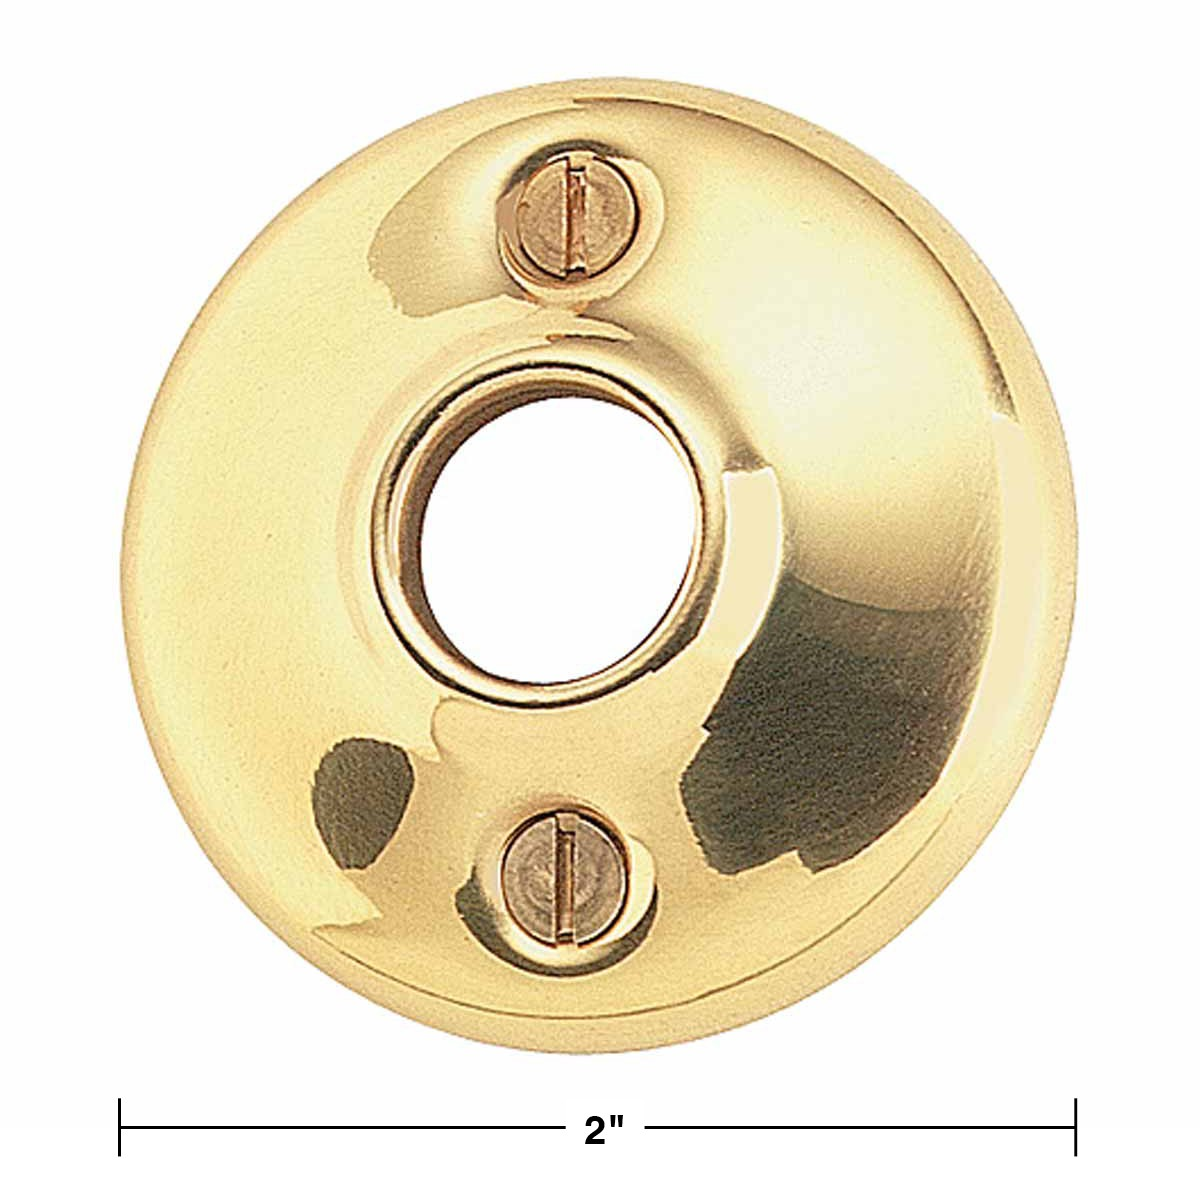 Spec U003cPREu003e4 Pairs Colonial Door Rosettes Solid Brass Passage Knob ...